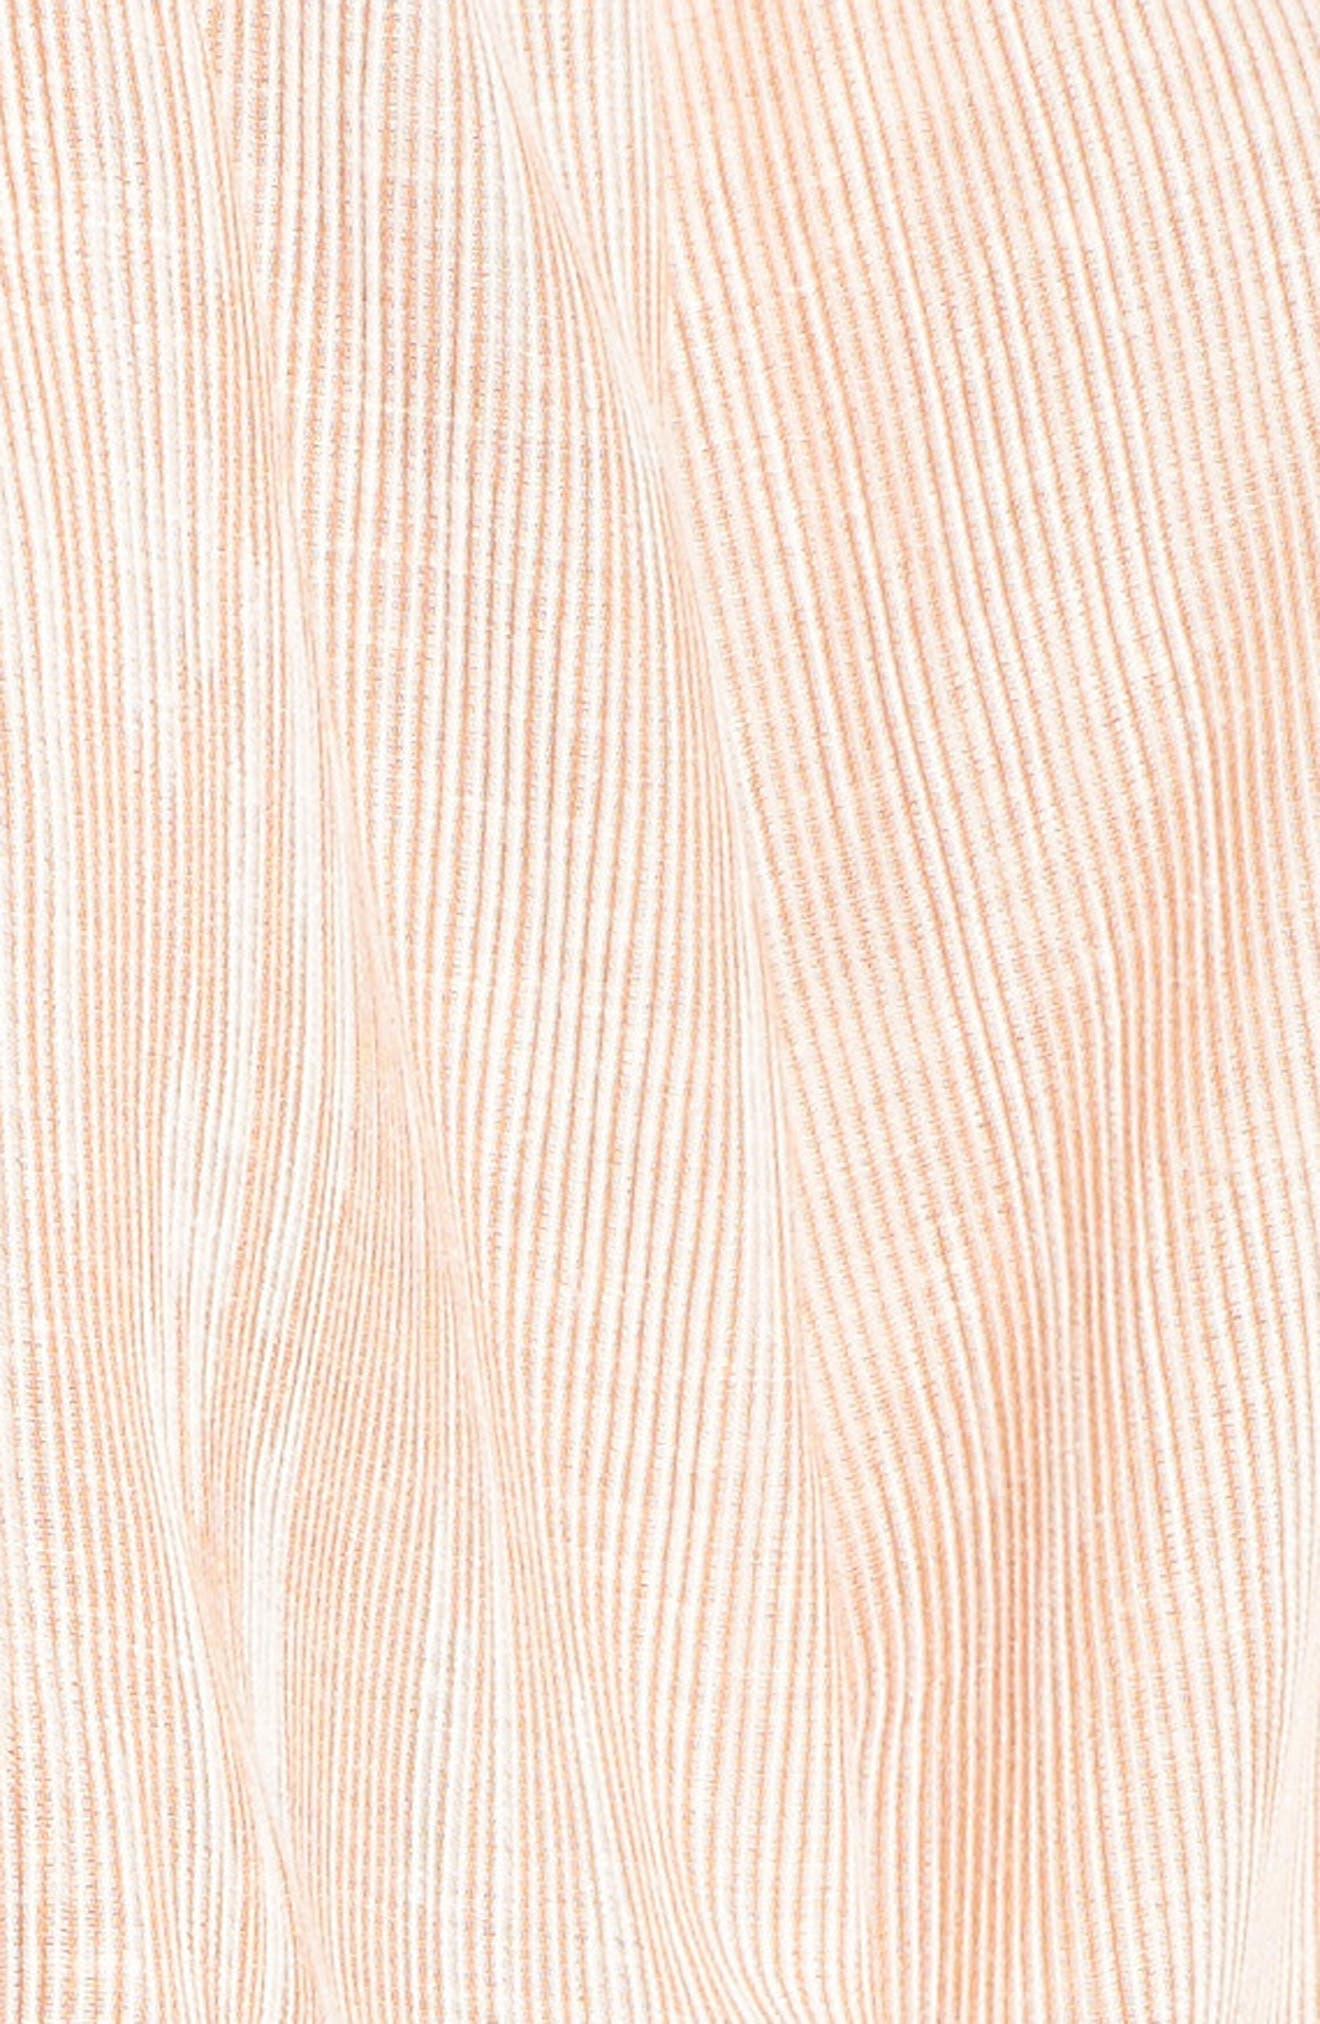 Tallulah Off the Shoulder Blouse,                             Alternate thumbnail 5, color,                             Burnt Umber/ White